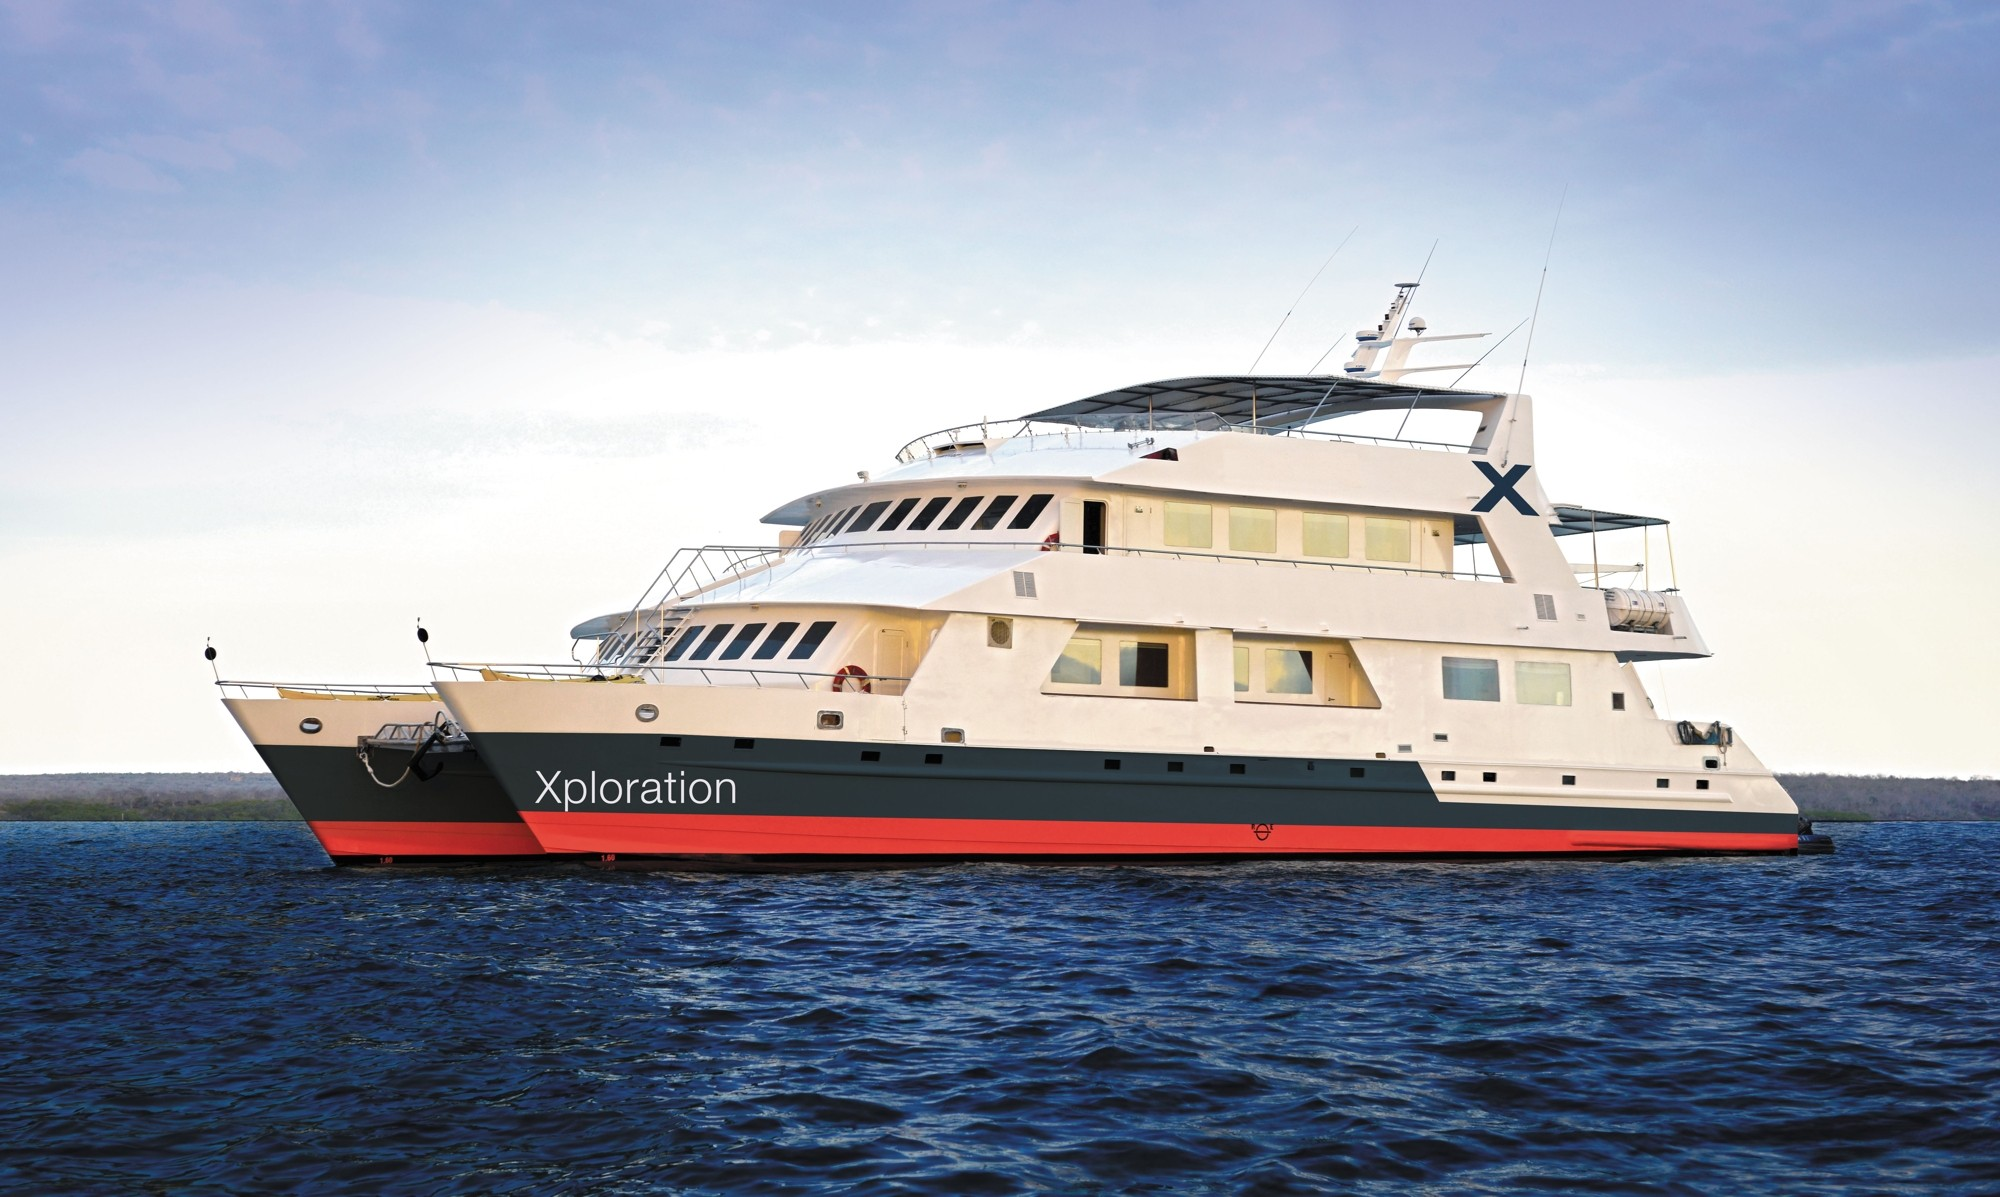 Ekvádor z Baltra na lodi Celebrity Xploration, plavba s bonusem